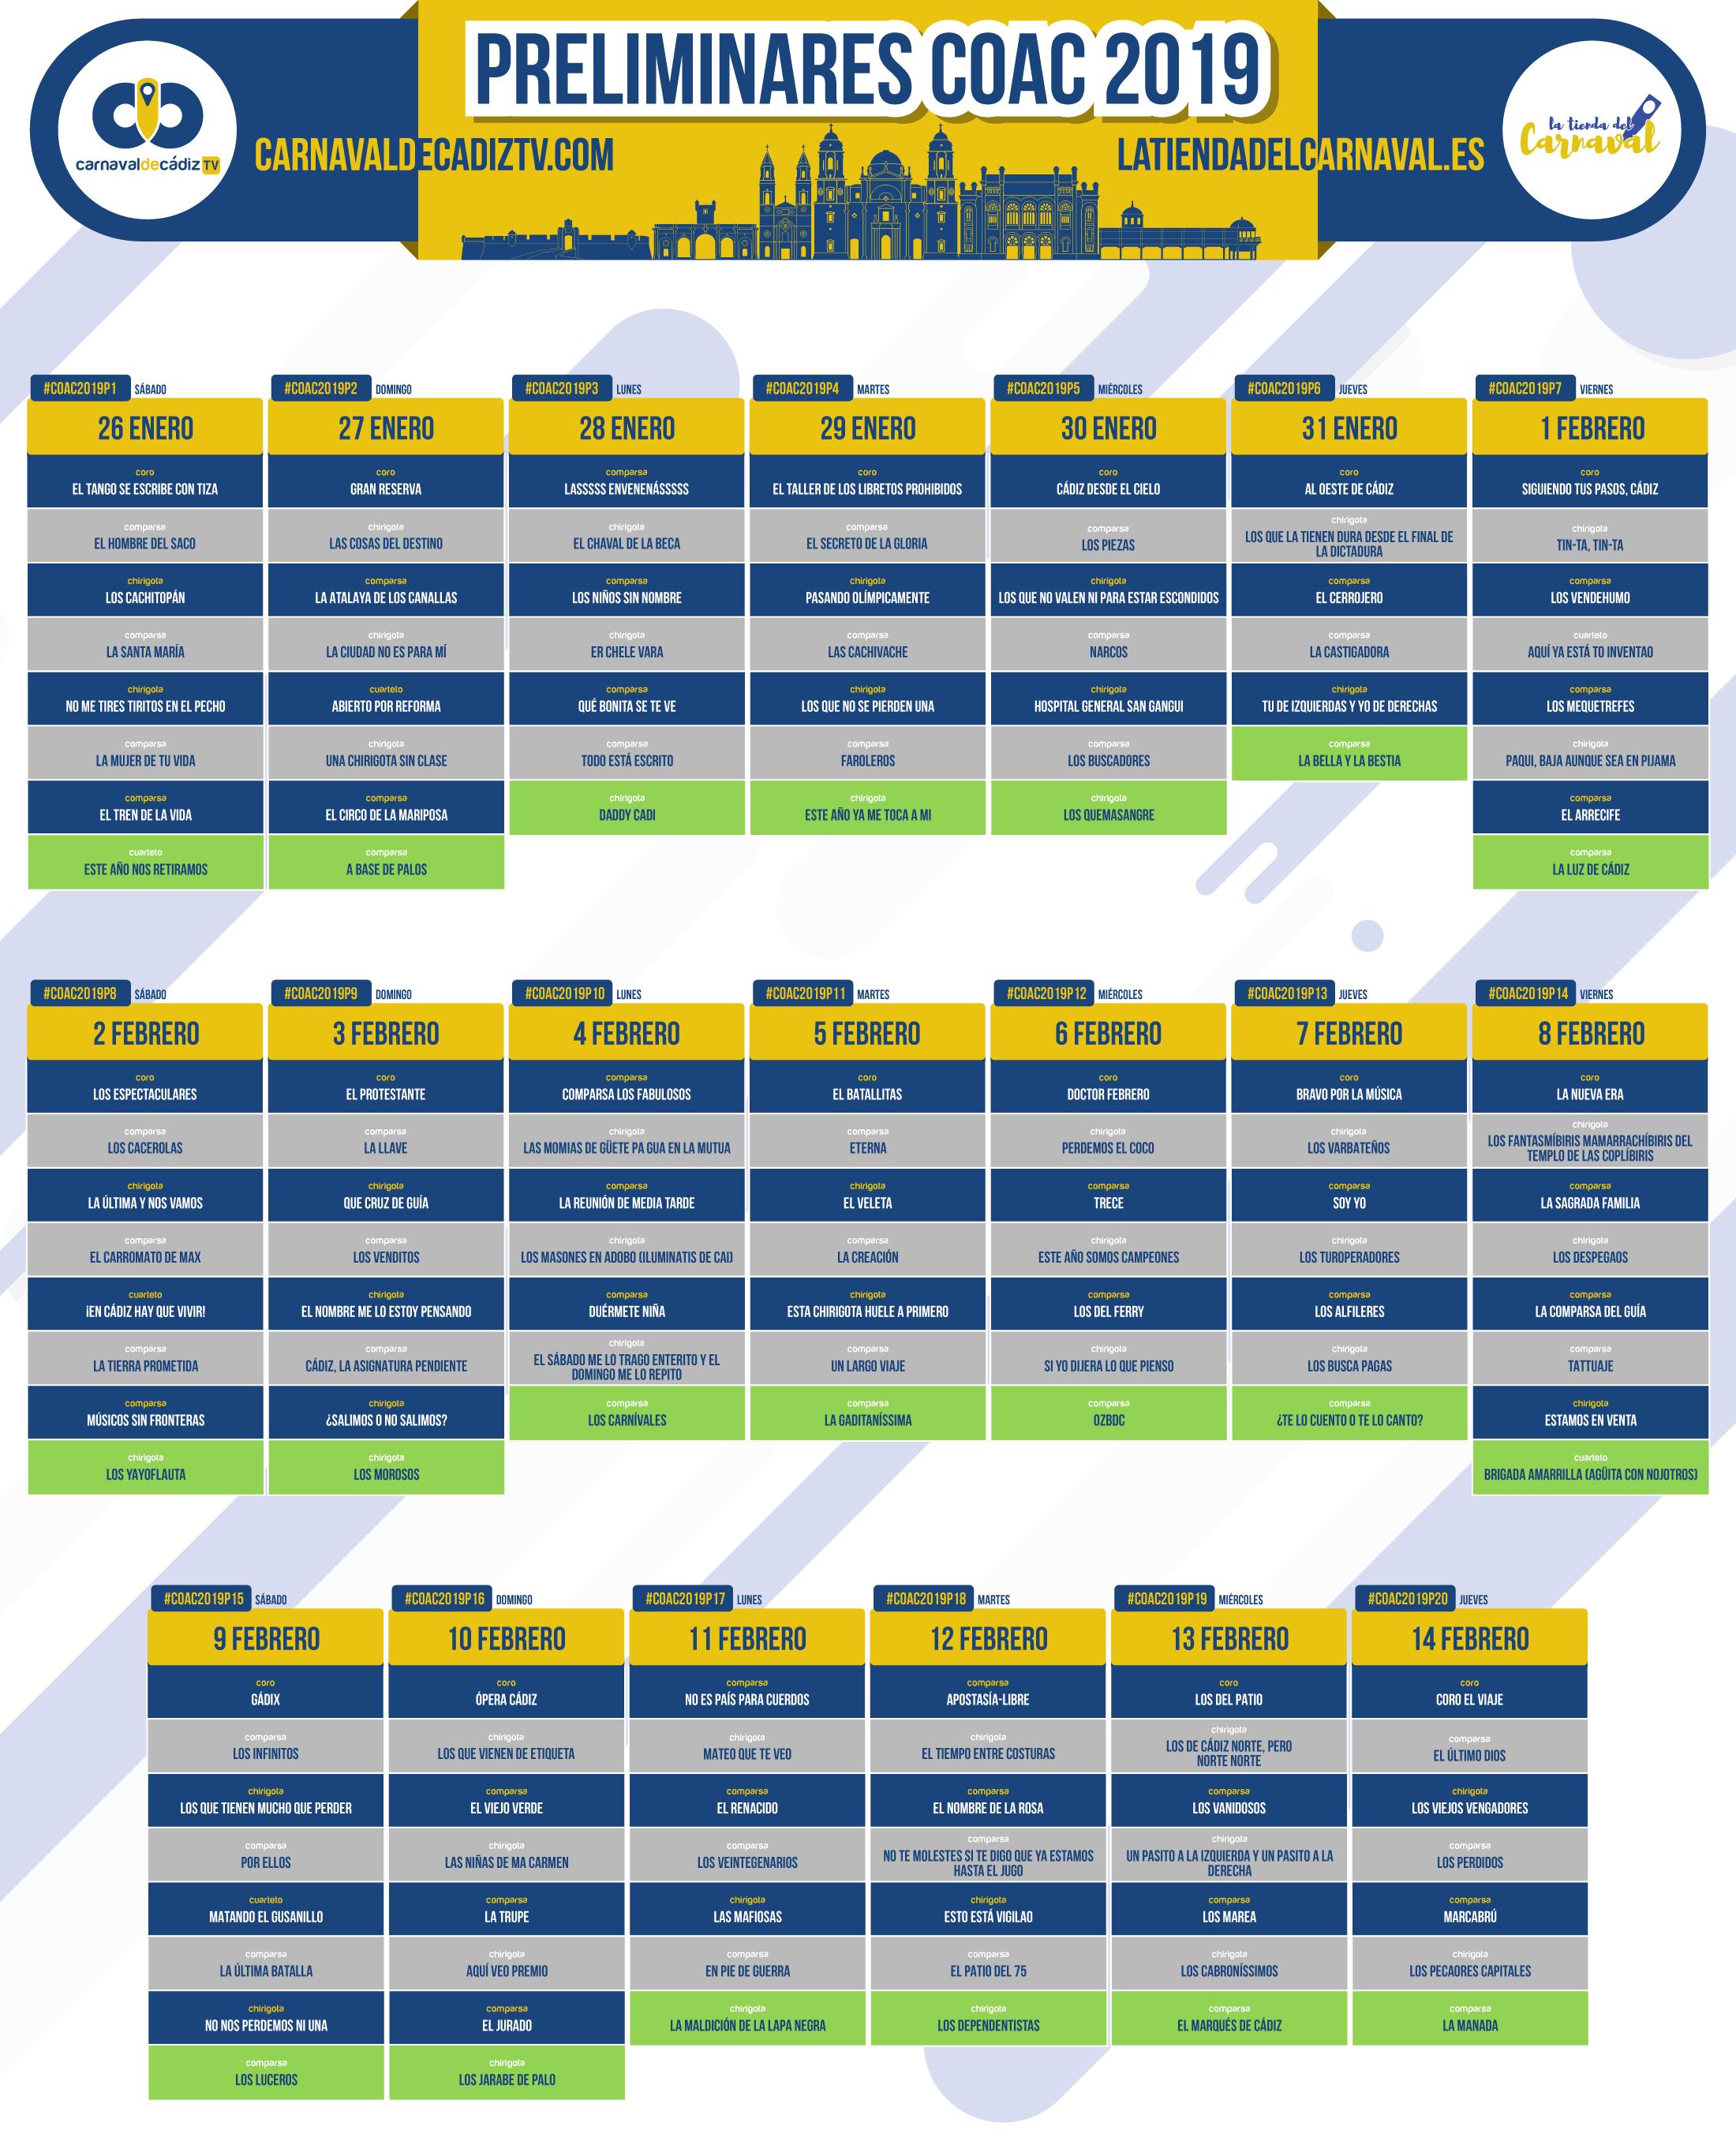 Calendario Coac 2019.Preliminares Coac 2019 Preliminares Carnaval De Cadiz 2019